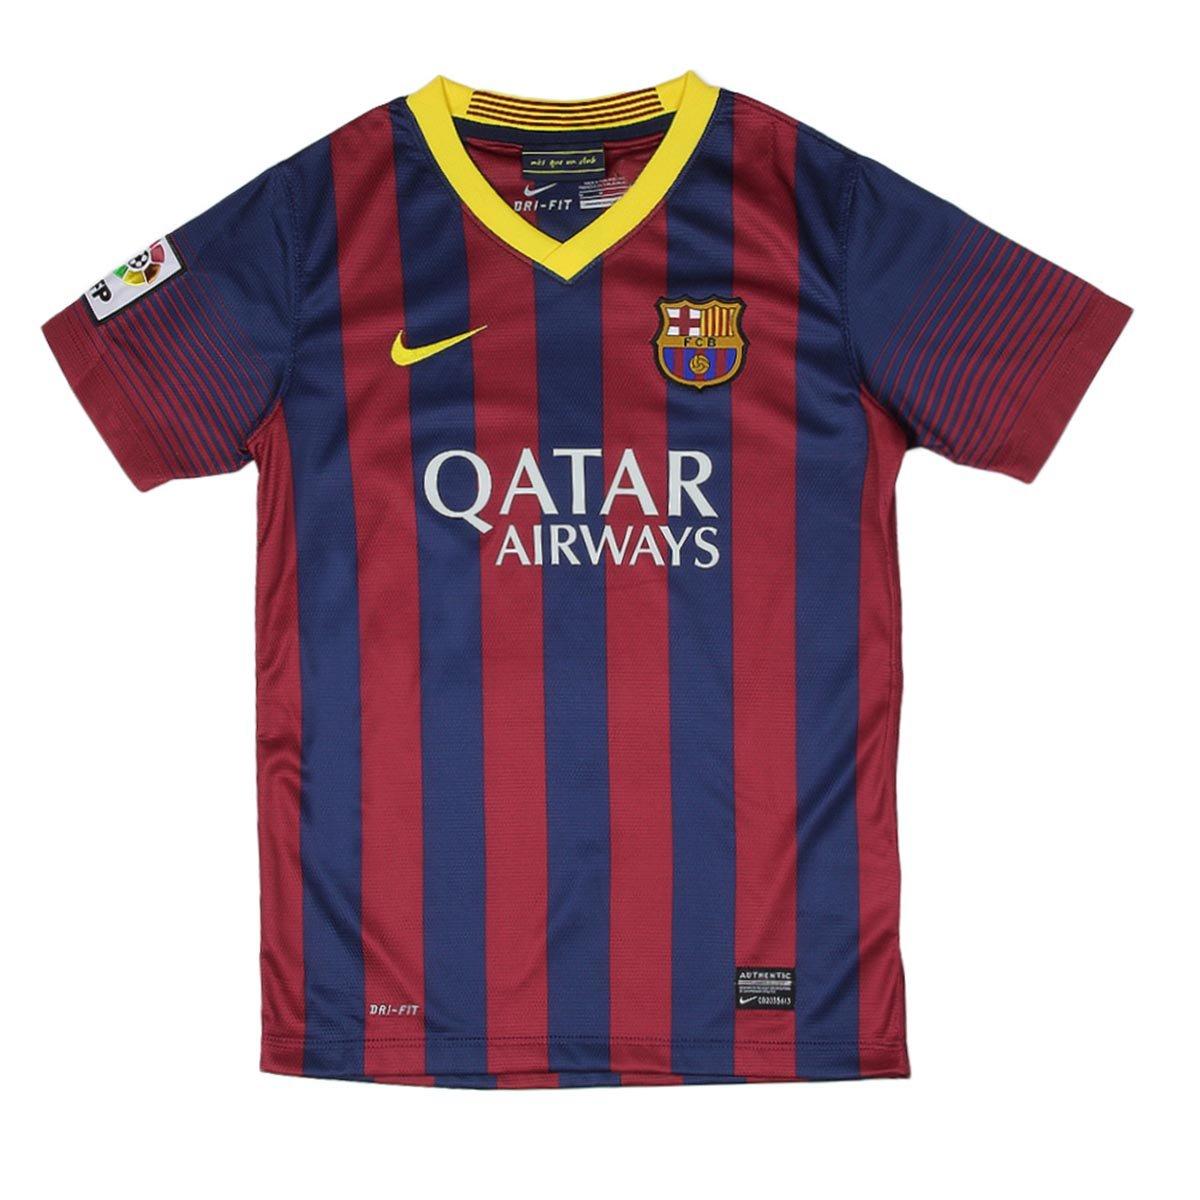 Buy Nike Fc Barcelona Home Jersey 2013 14 Boys Junior